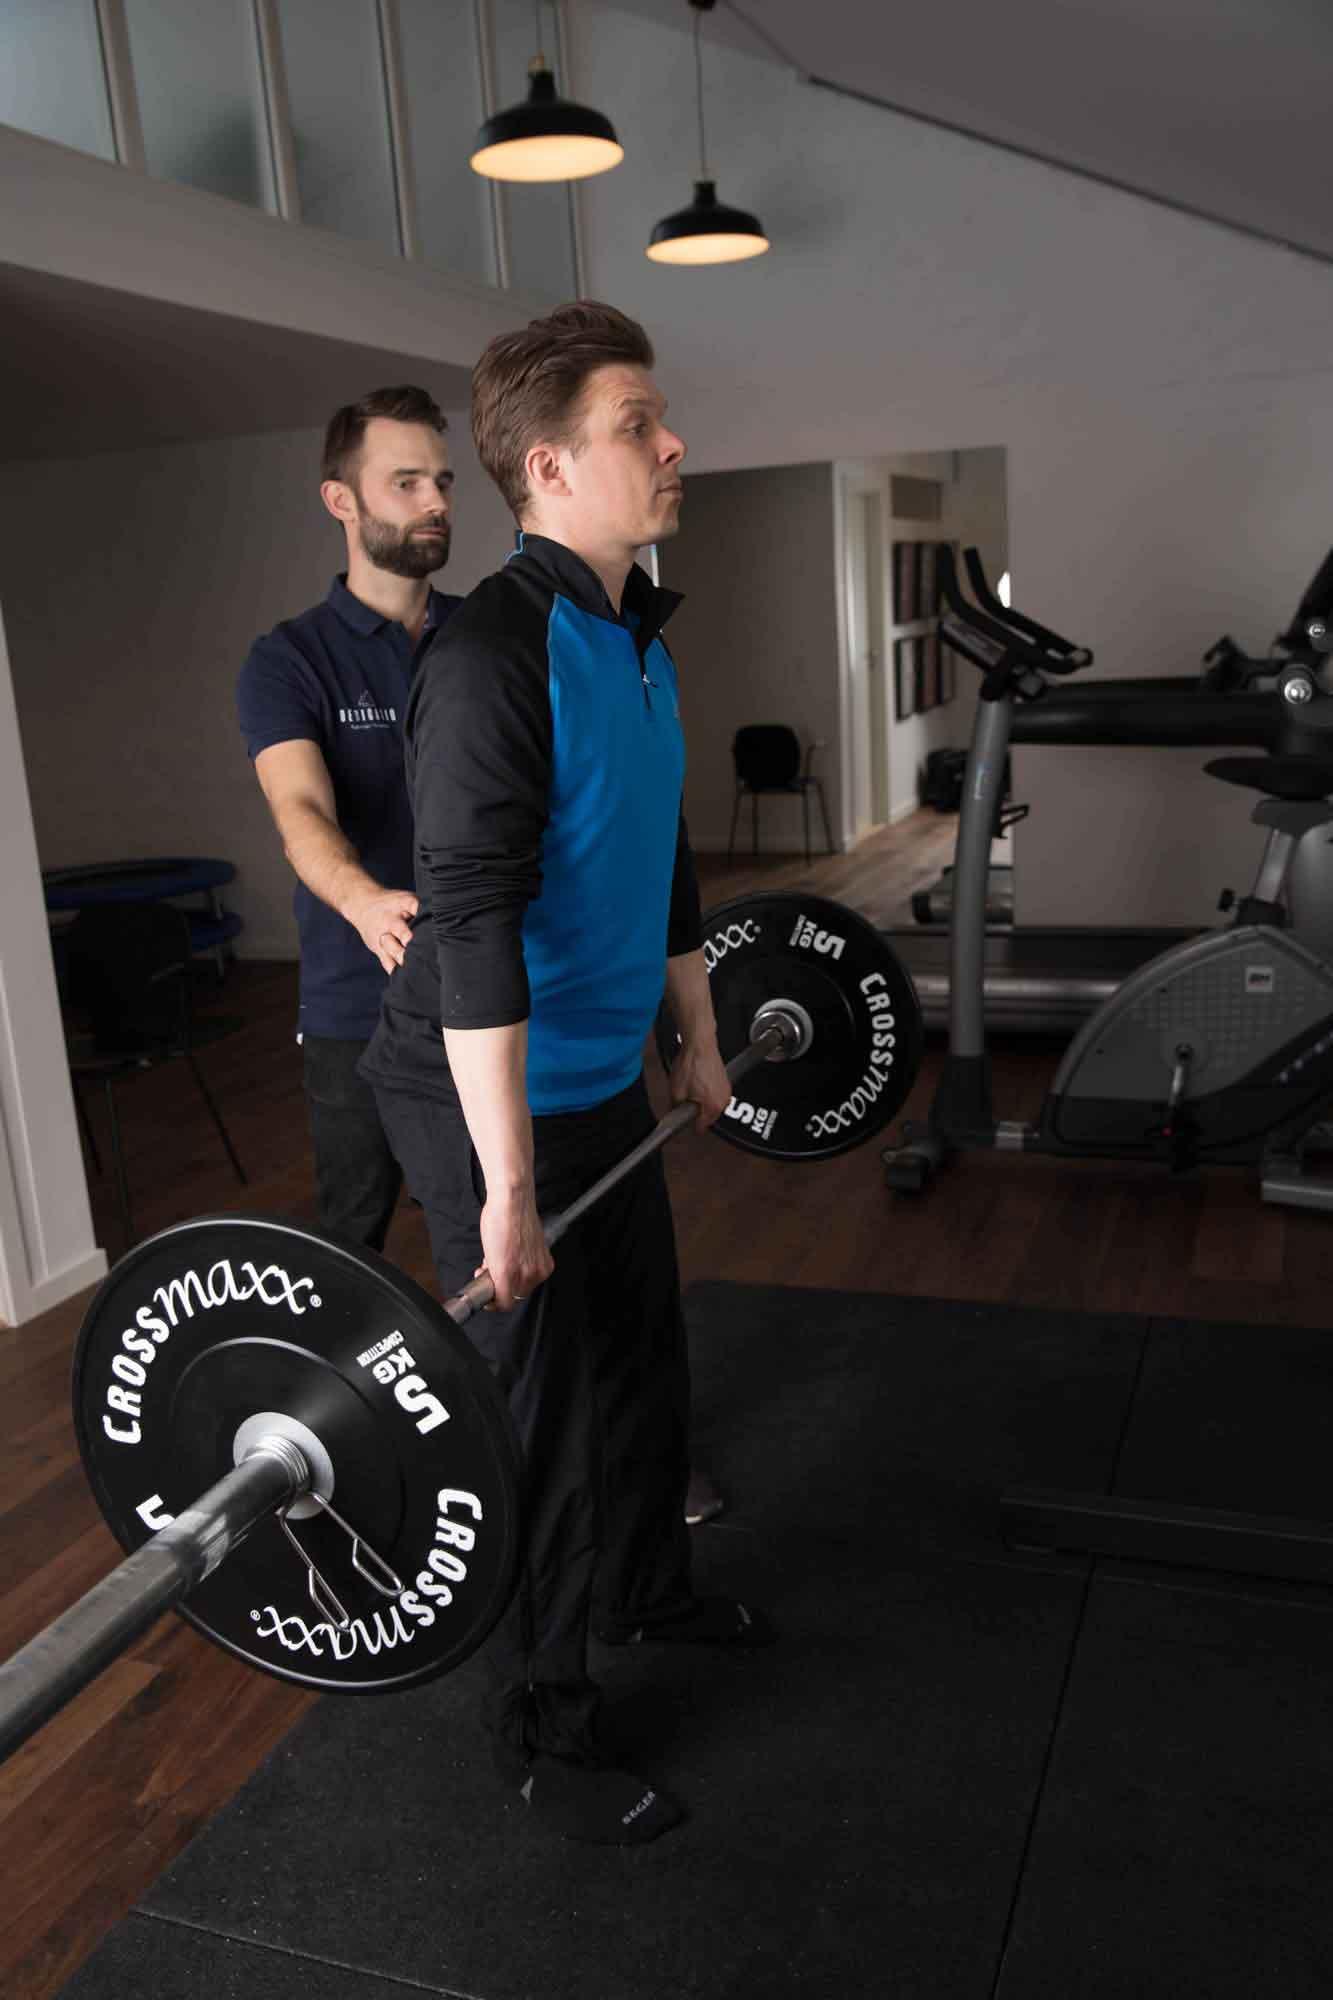 Træning Dedicatio Fysioterapi i Valby